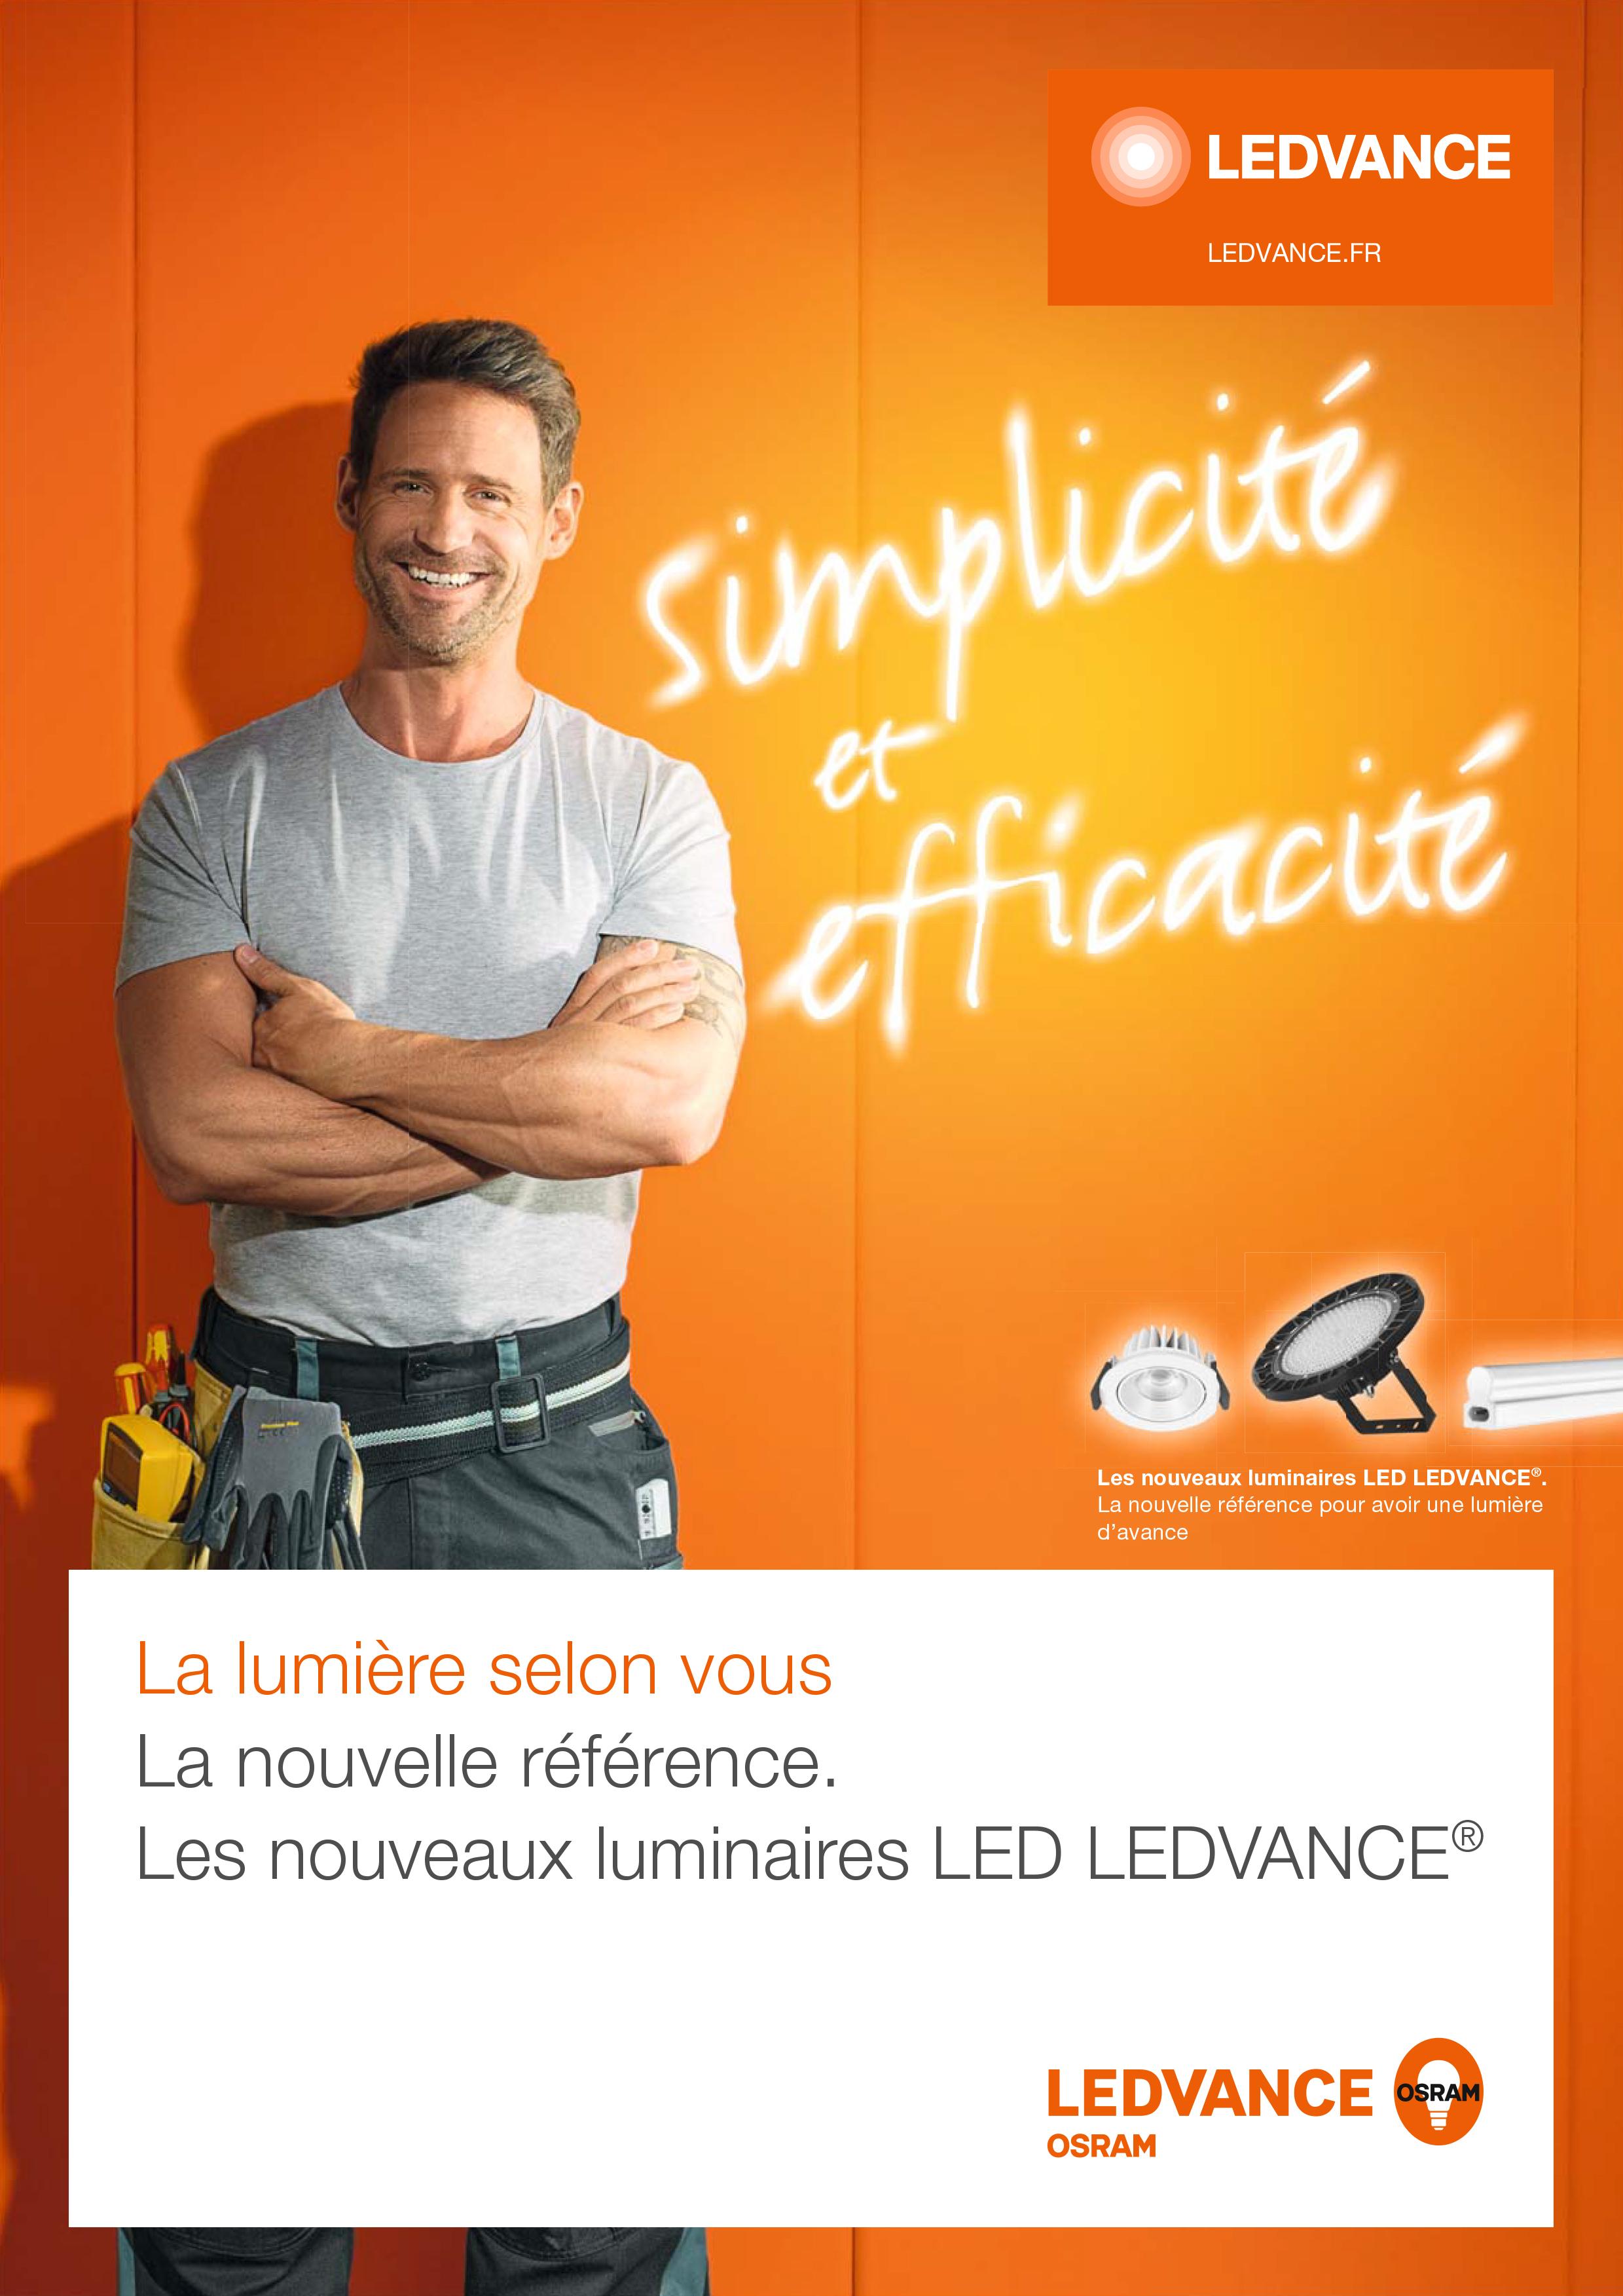 66515_LEDVANCE_Luminaires_PI_33FS.indd